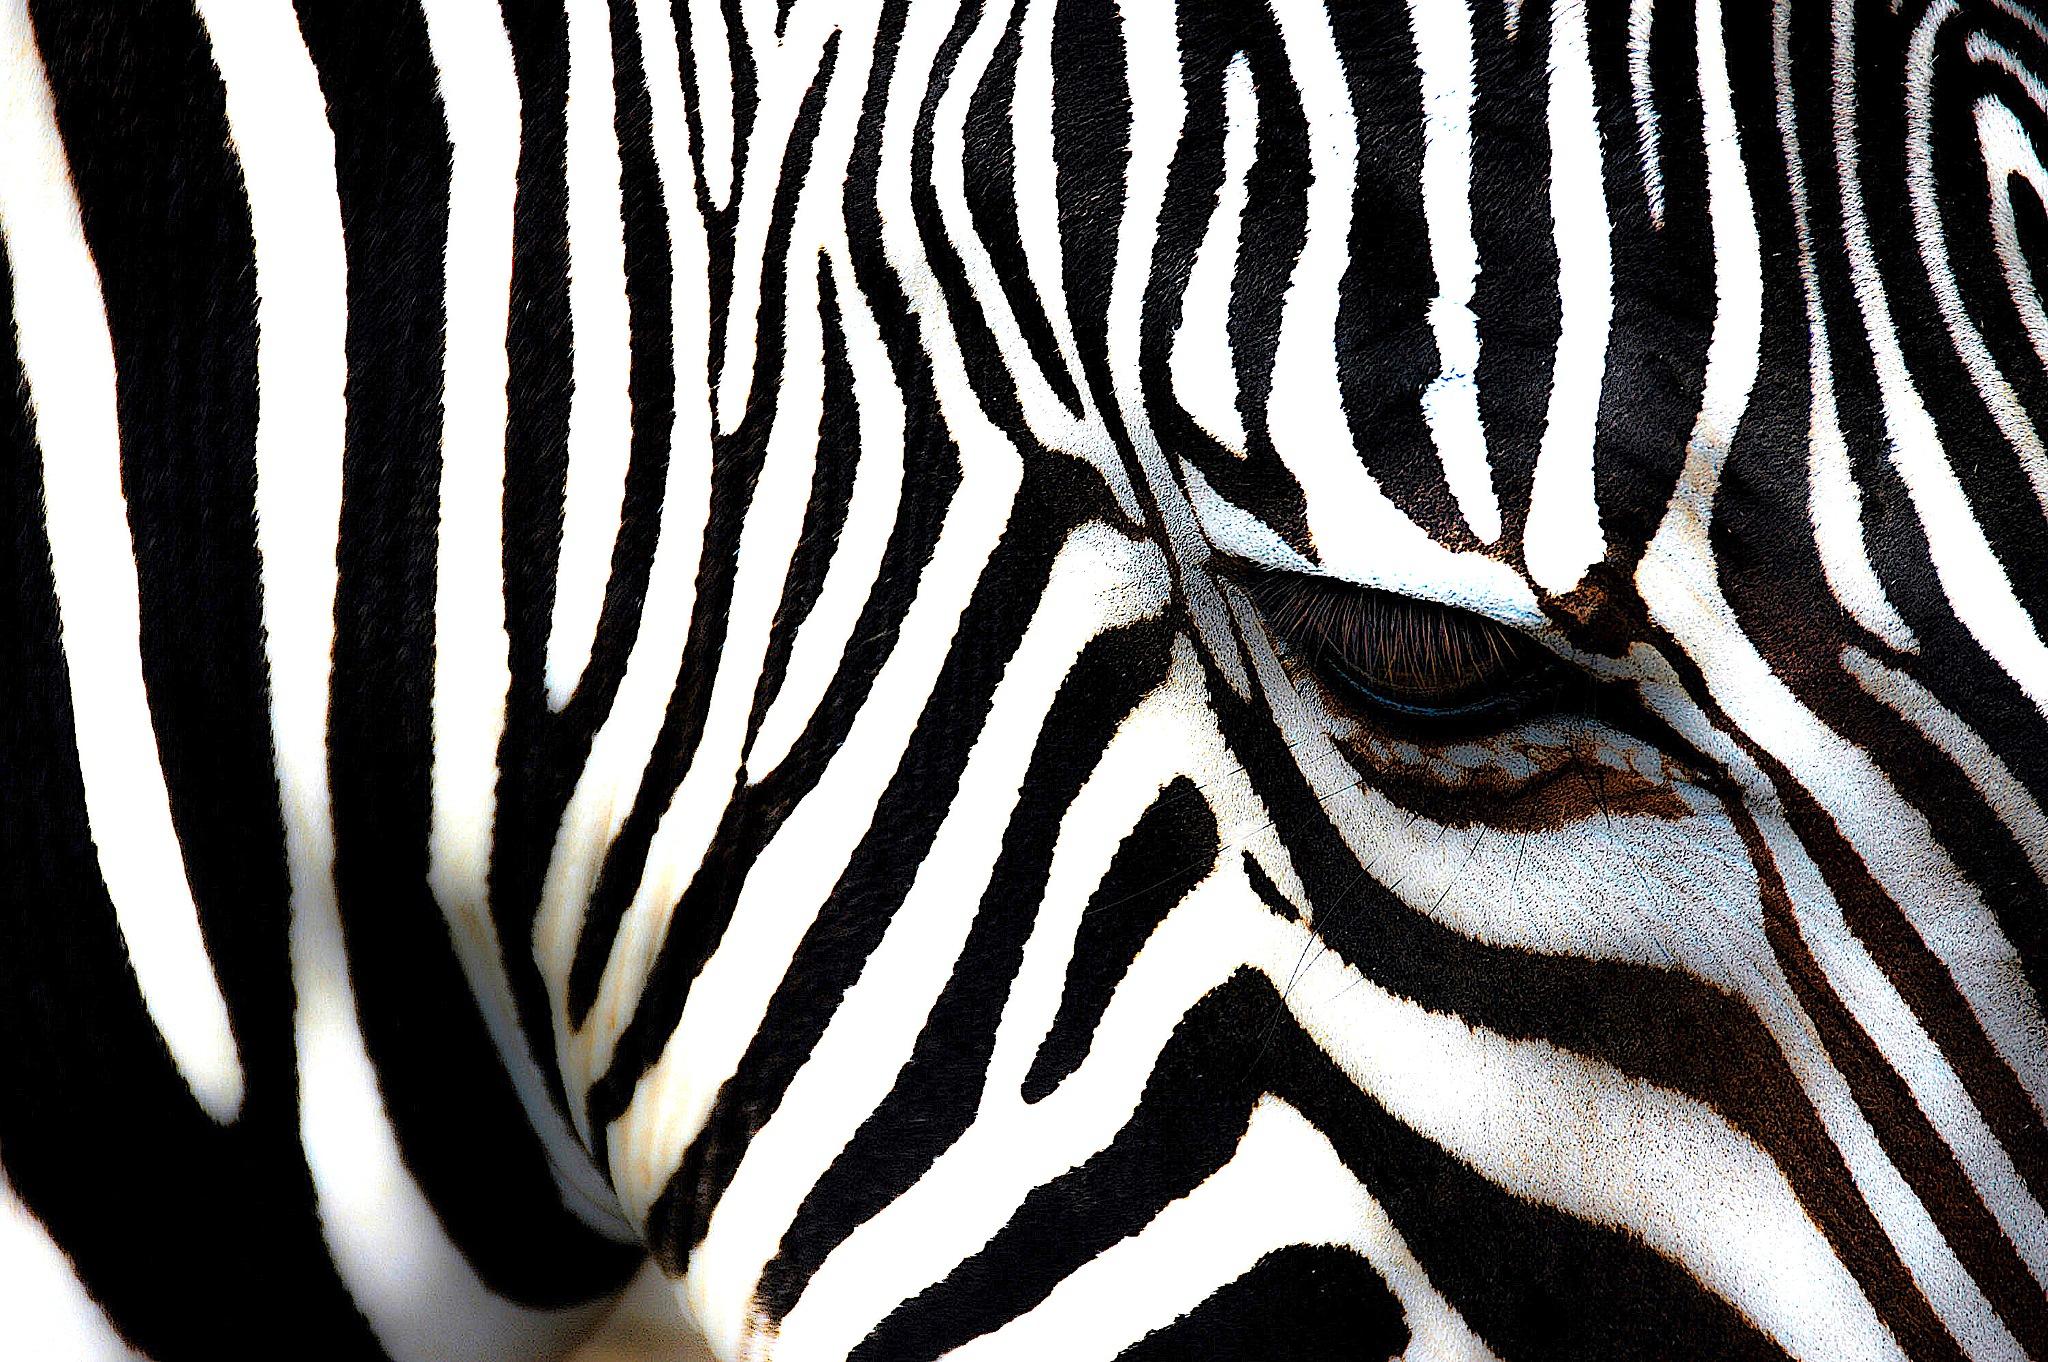 zebra 14 by sonny_roger_sonneland